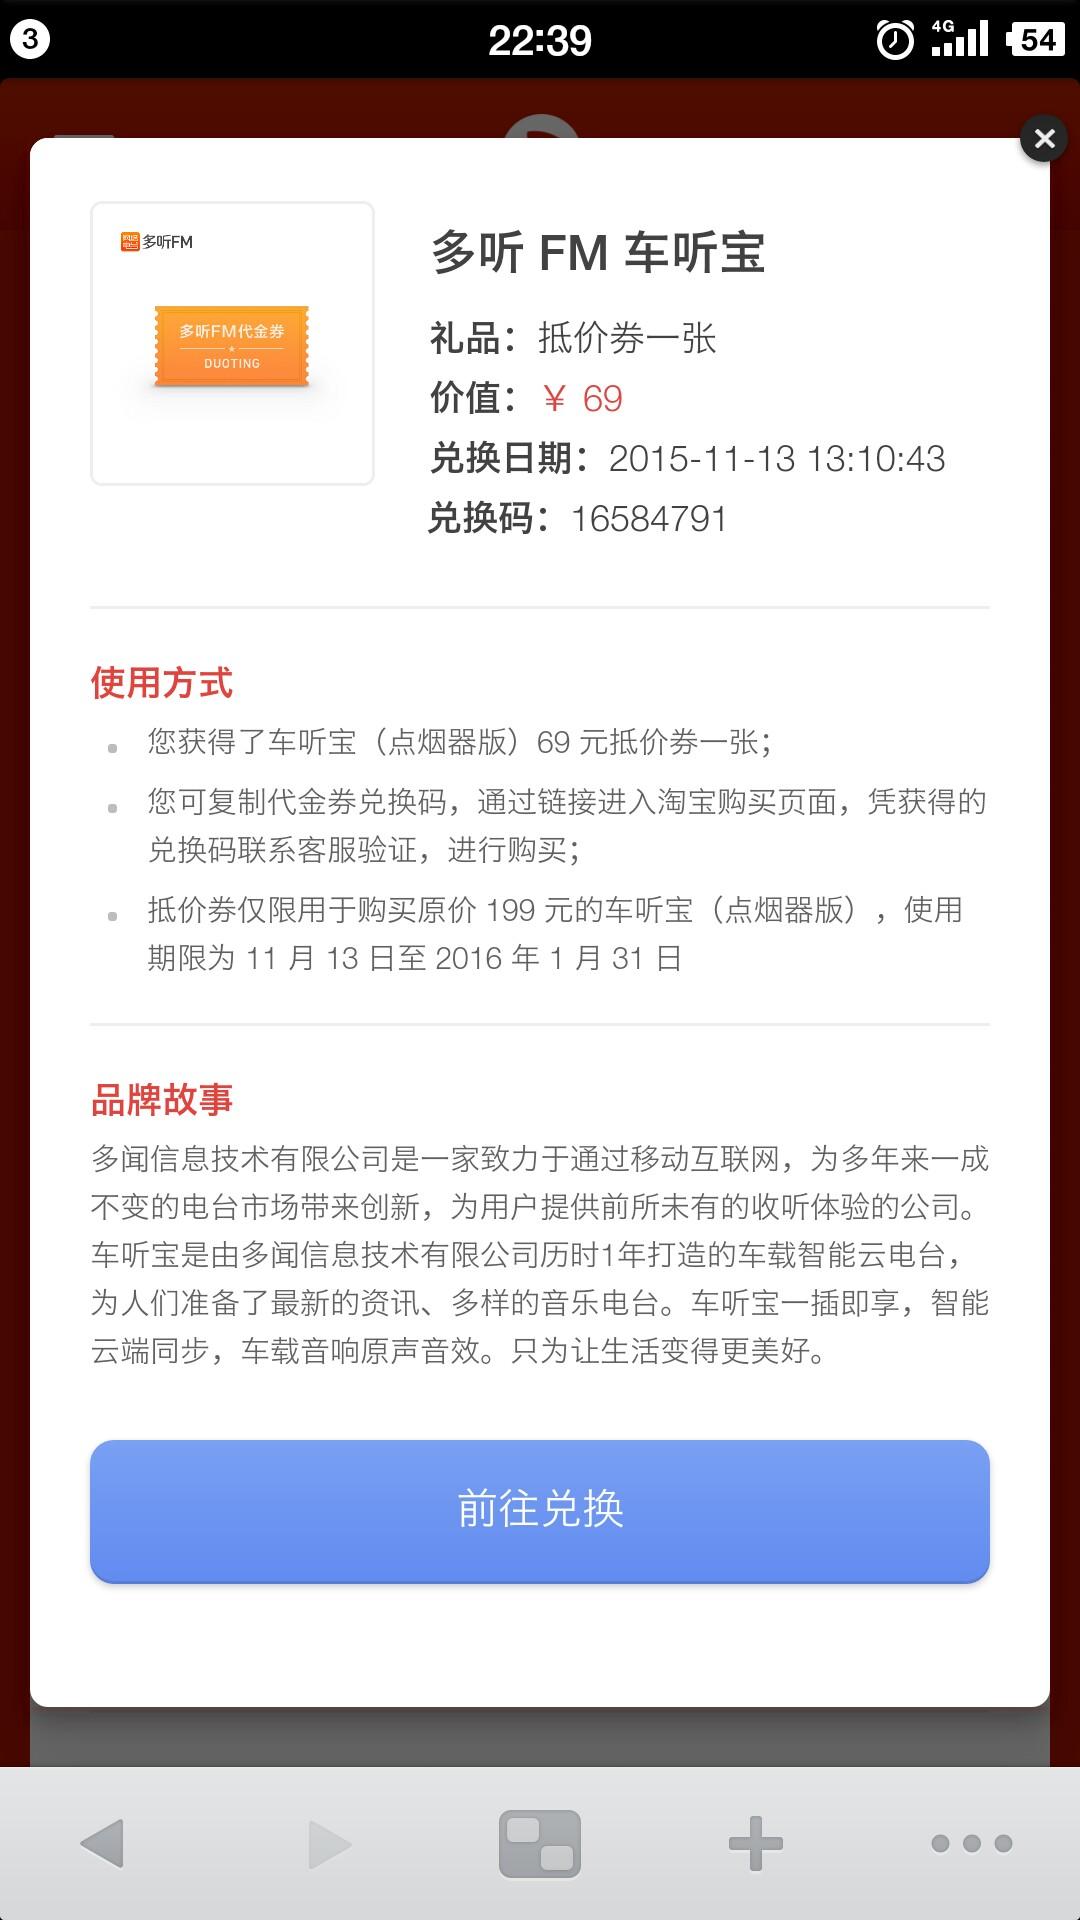 Screenshot_2015-12-24-22-39-39-920_???.png